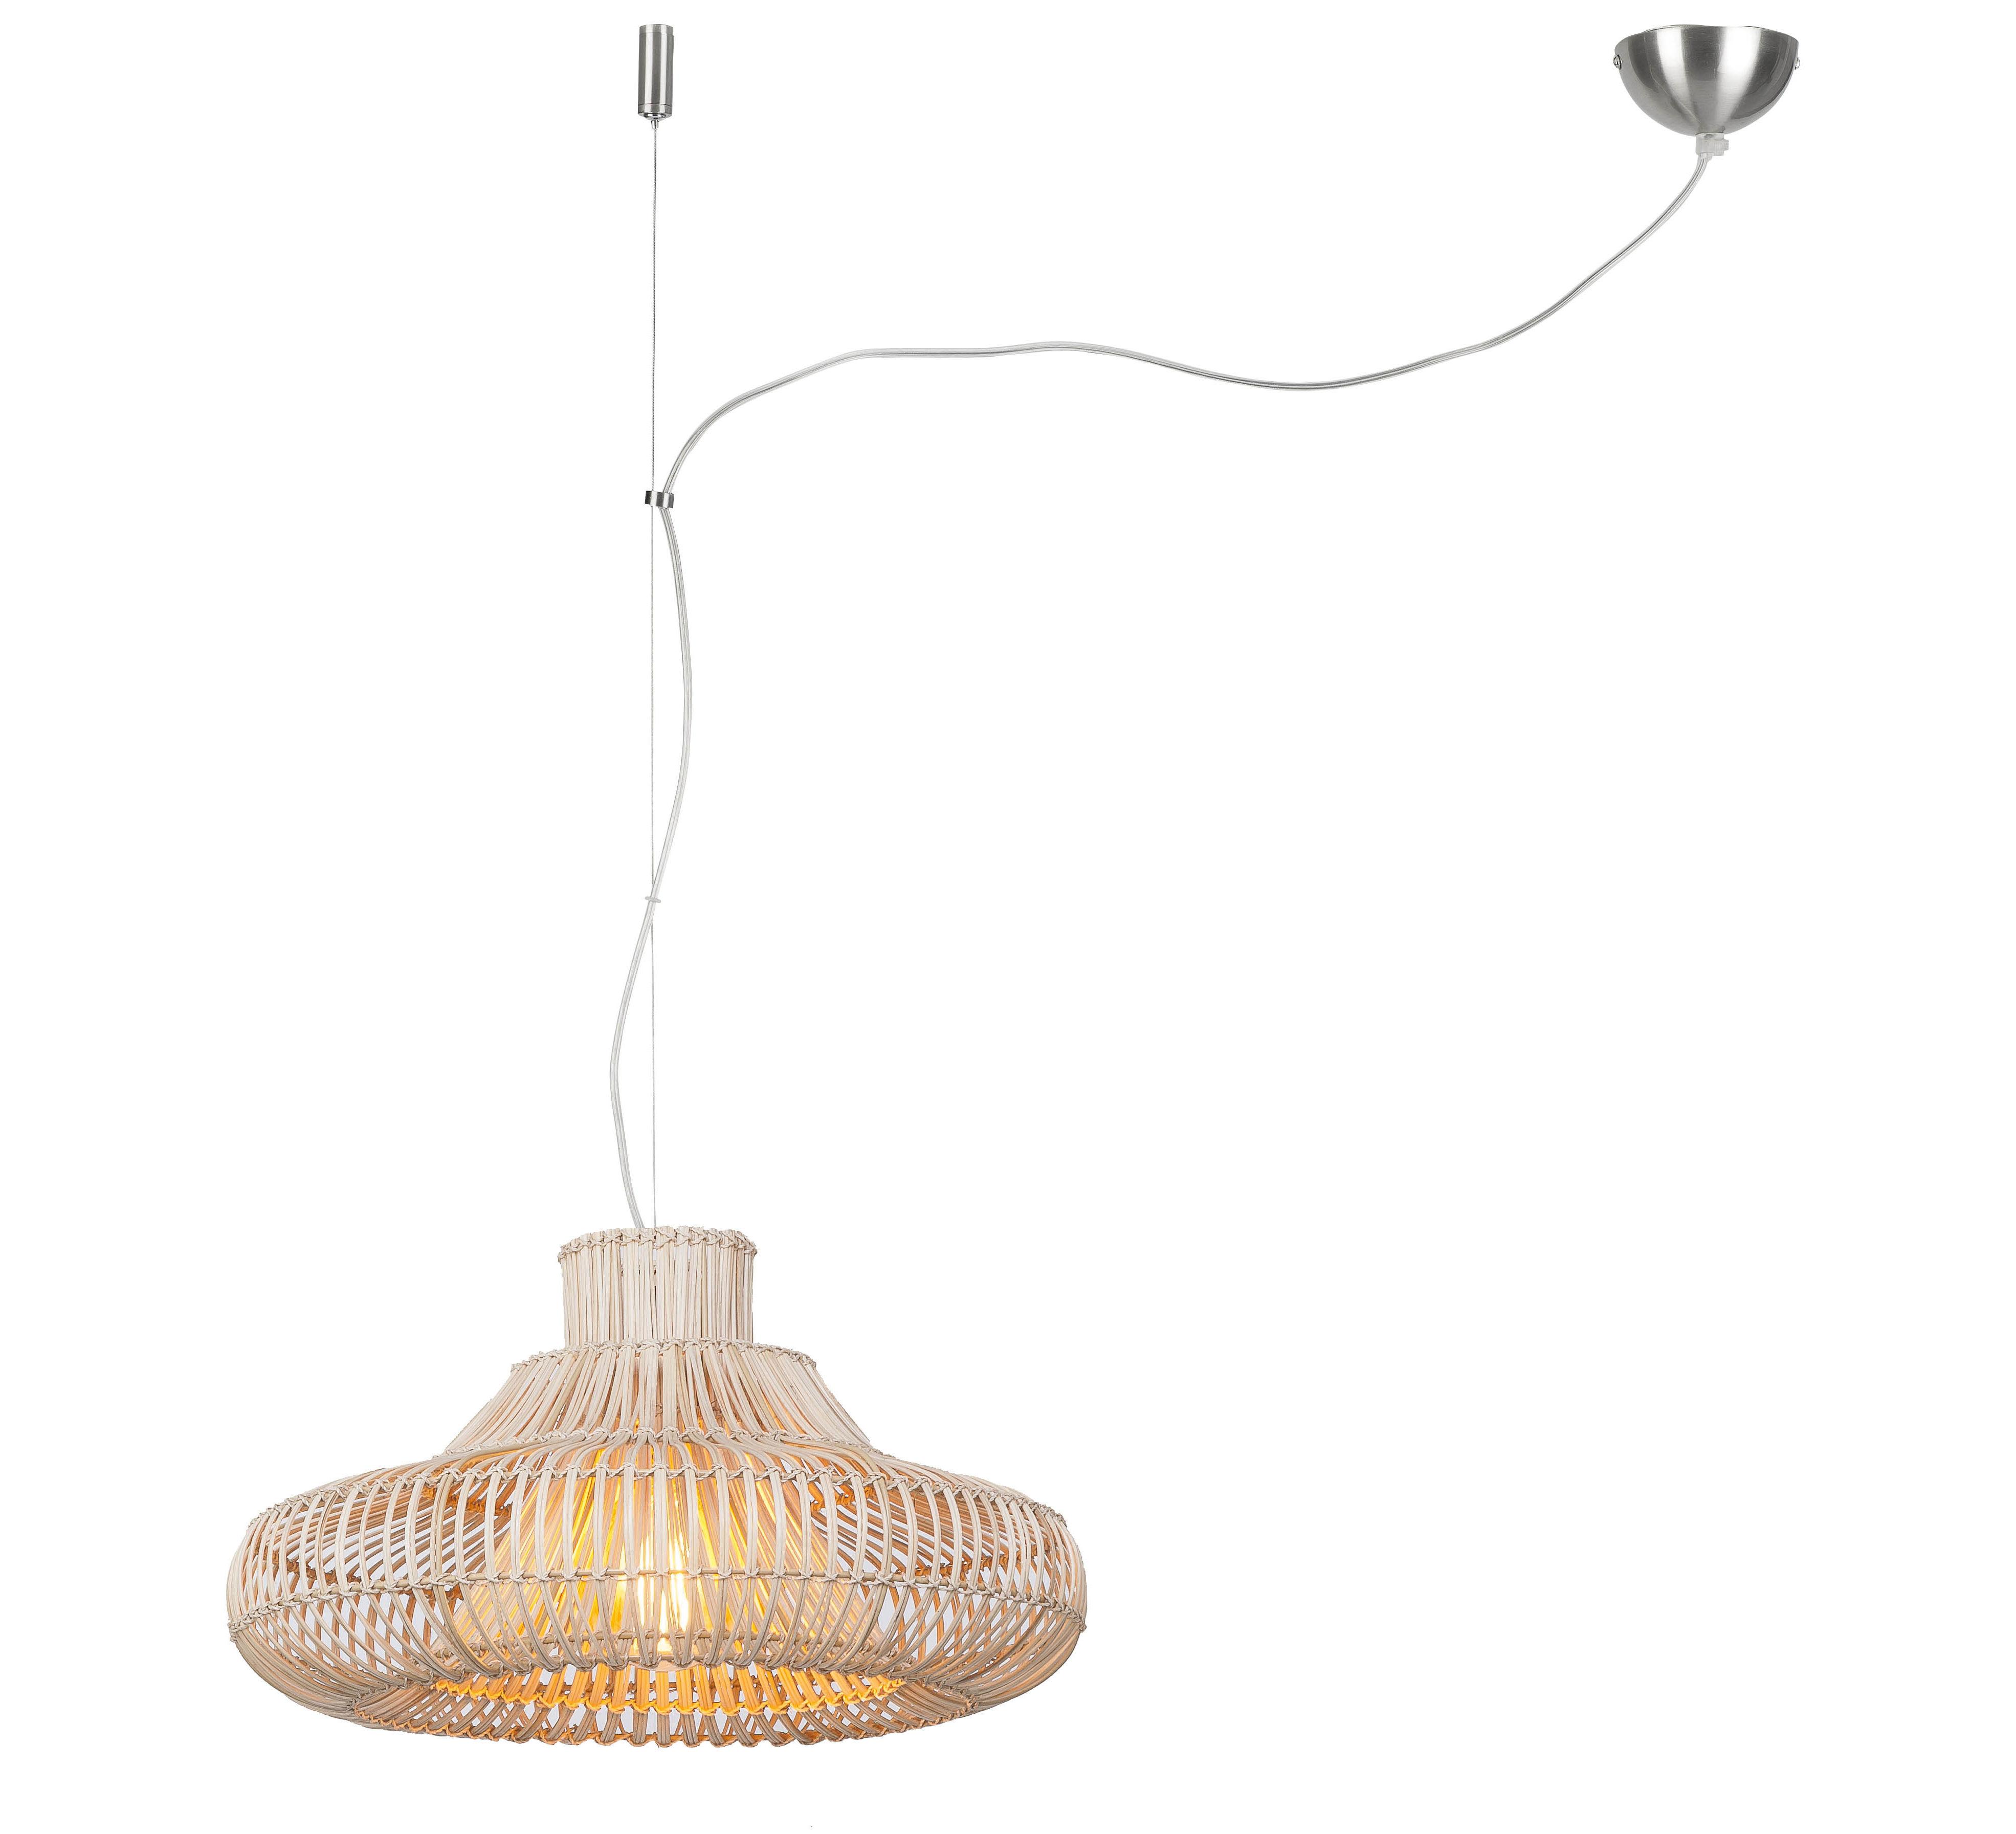 Illuminazione - Lampadari - Sospensione Kalahari Small - / Bambù - Ø 45 cm di GOOD&MOJO - Ø 45 cm / Rattan - Midollino